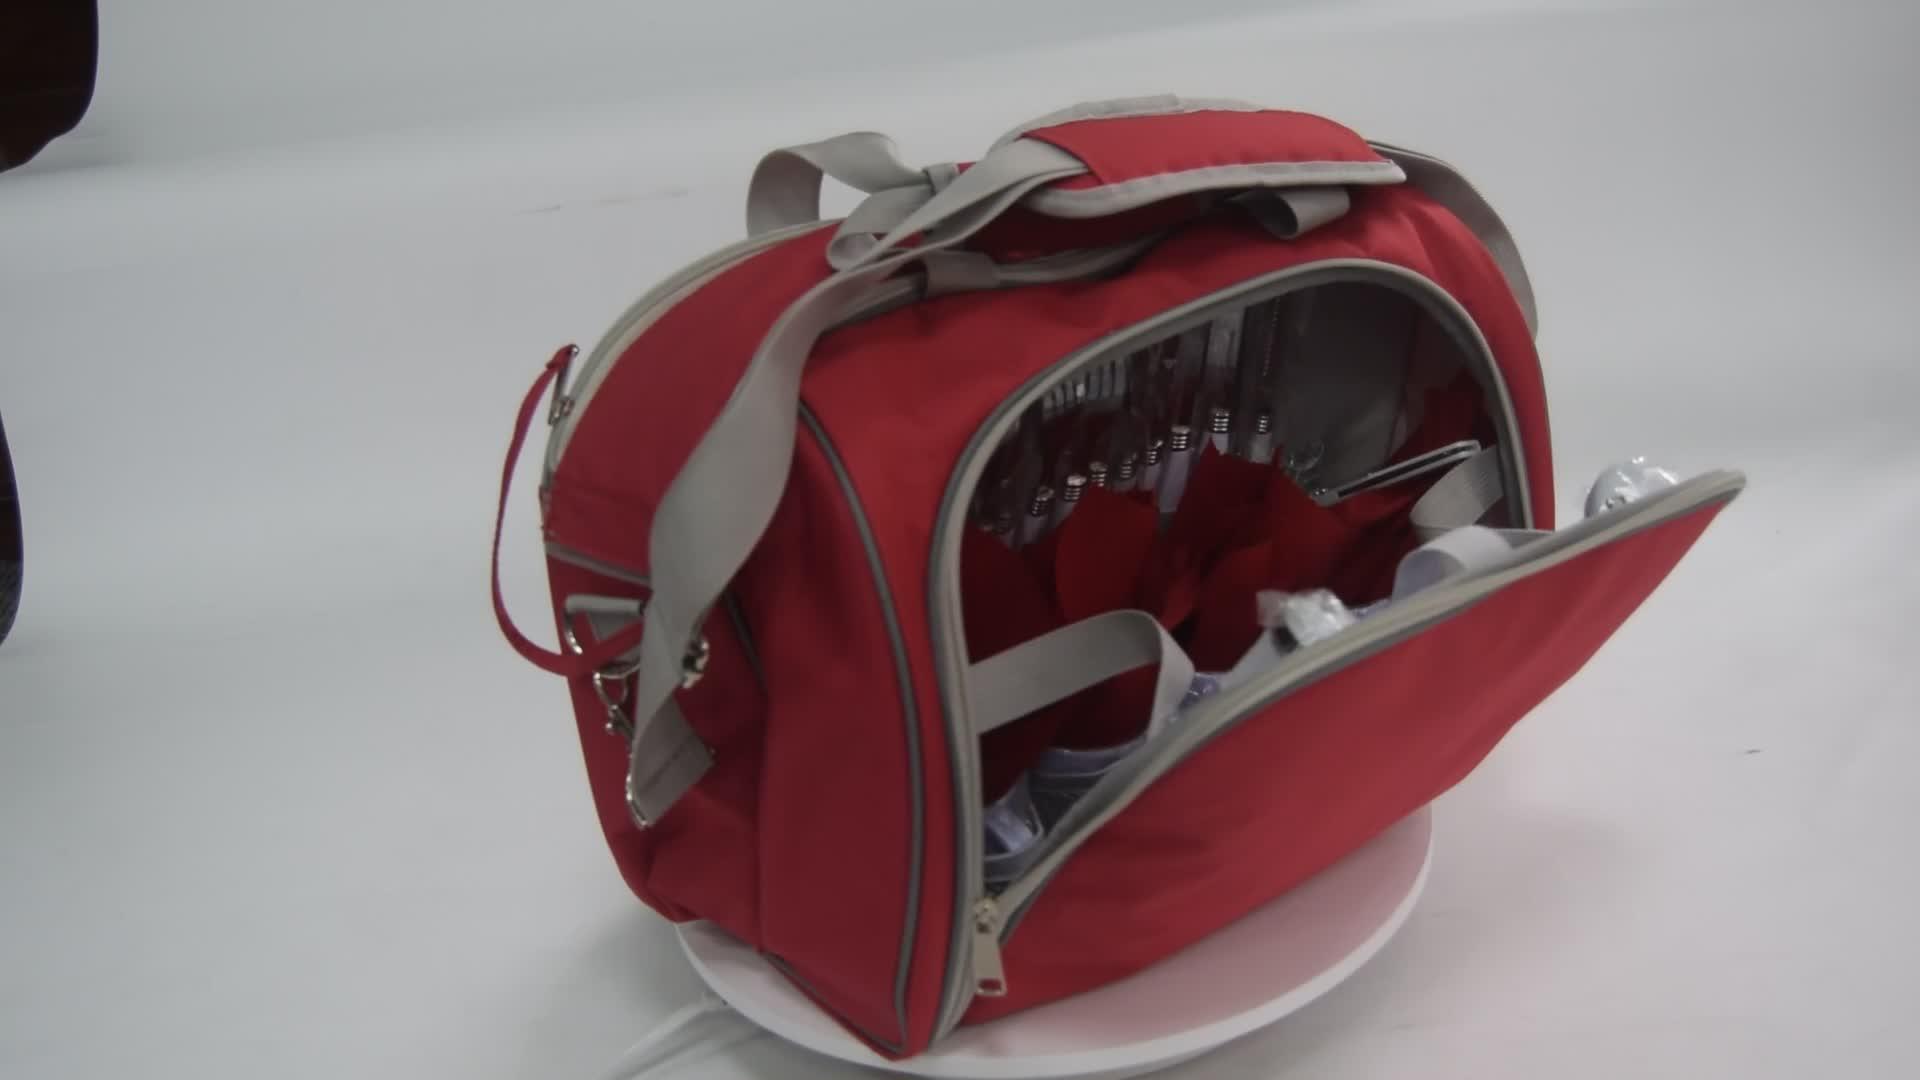 Hot Sell OEM Cooler Picnic Bag Outdoor Insulated Picnic Basket Set 4Person Picnic Bag with Cooler Aluminum foil Lining